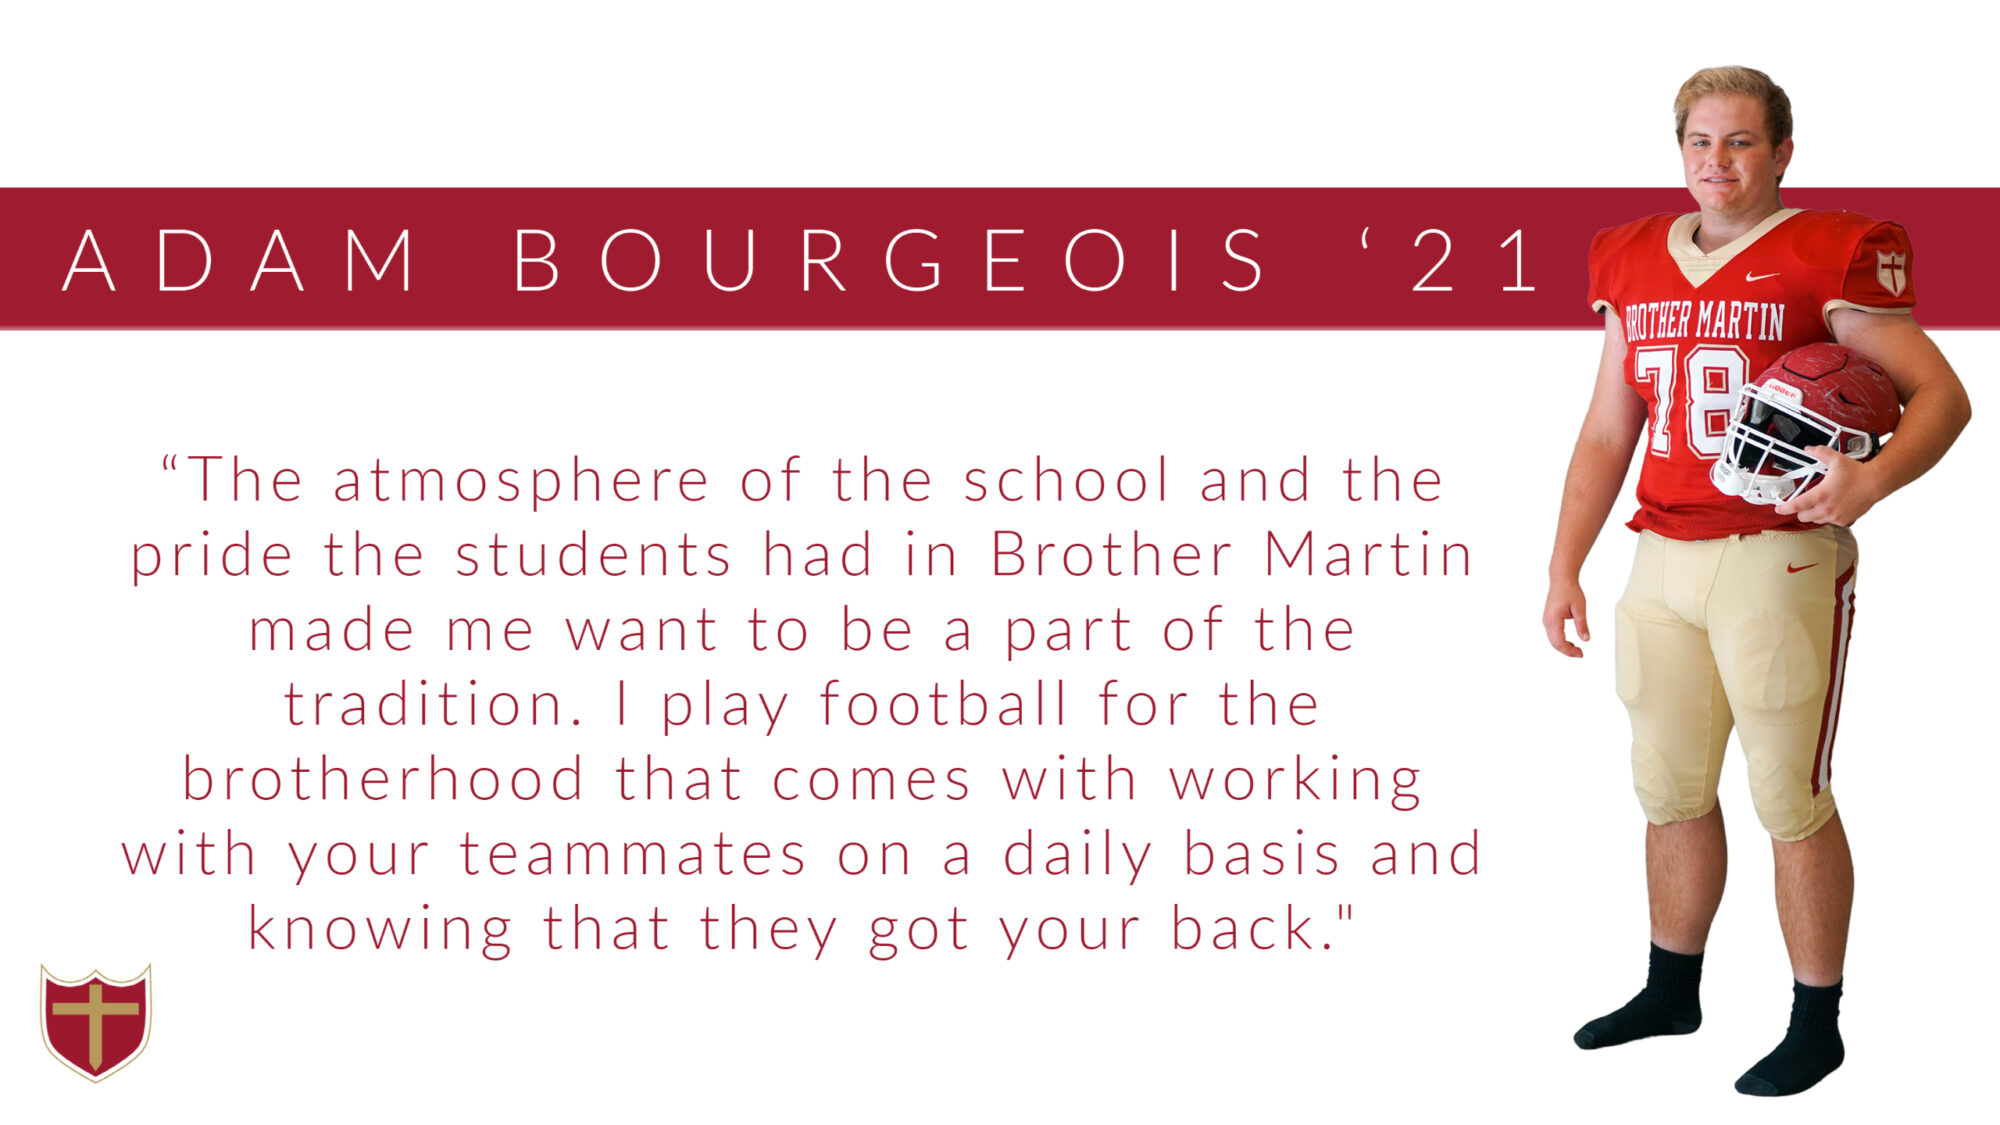 Bourgeois MTC